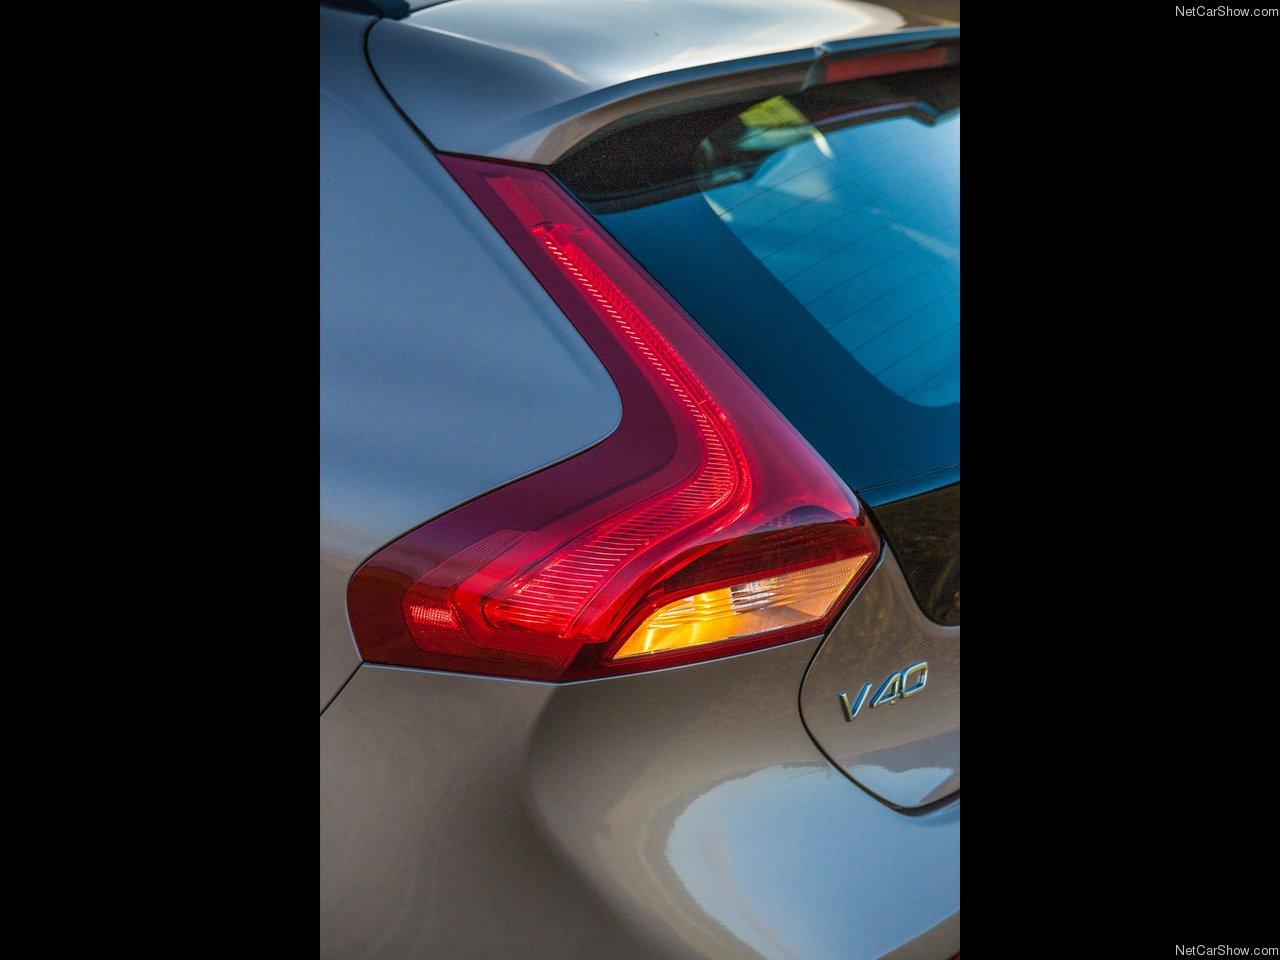 Volvo V40 Cross Country 2014 Volvo-V40_Cross_Country-2014-1280-26